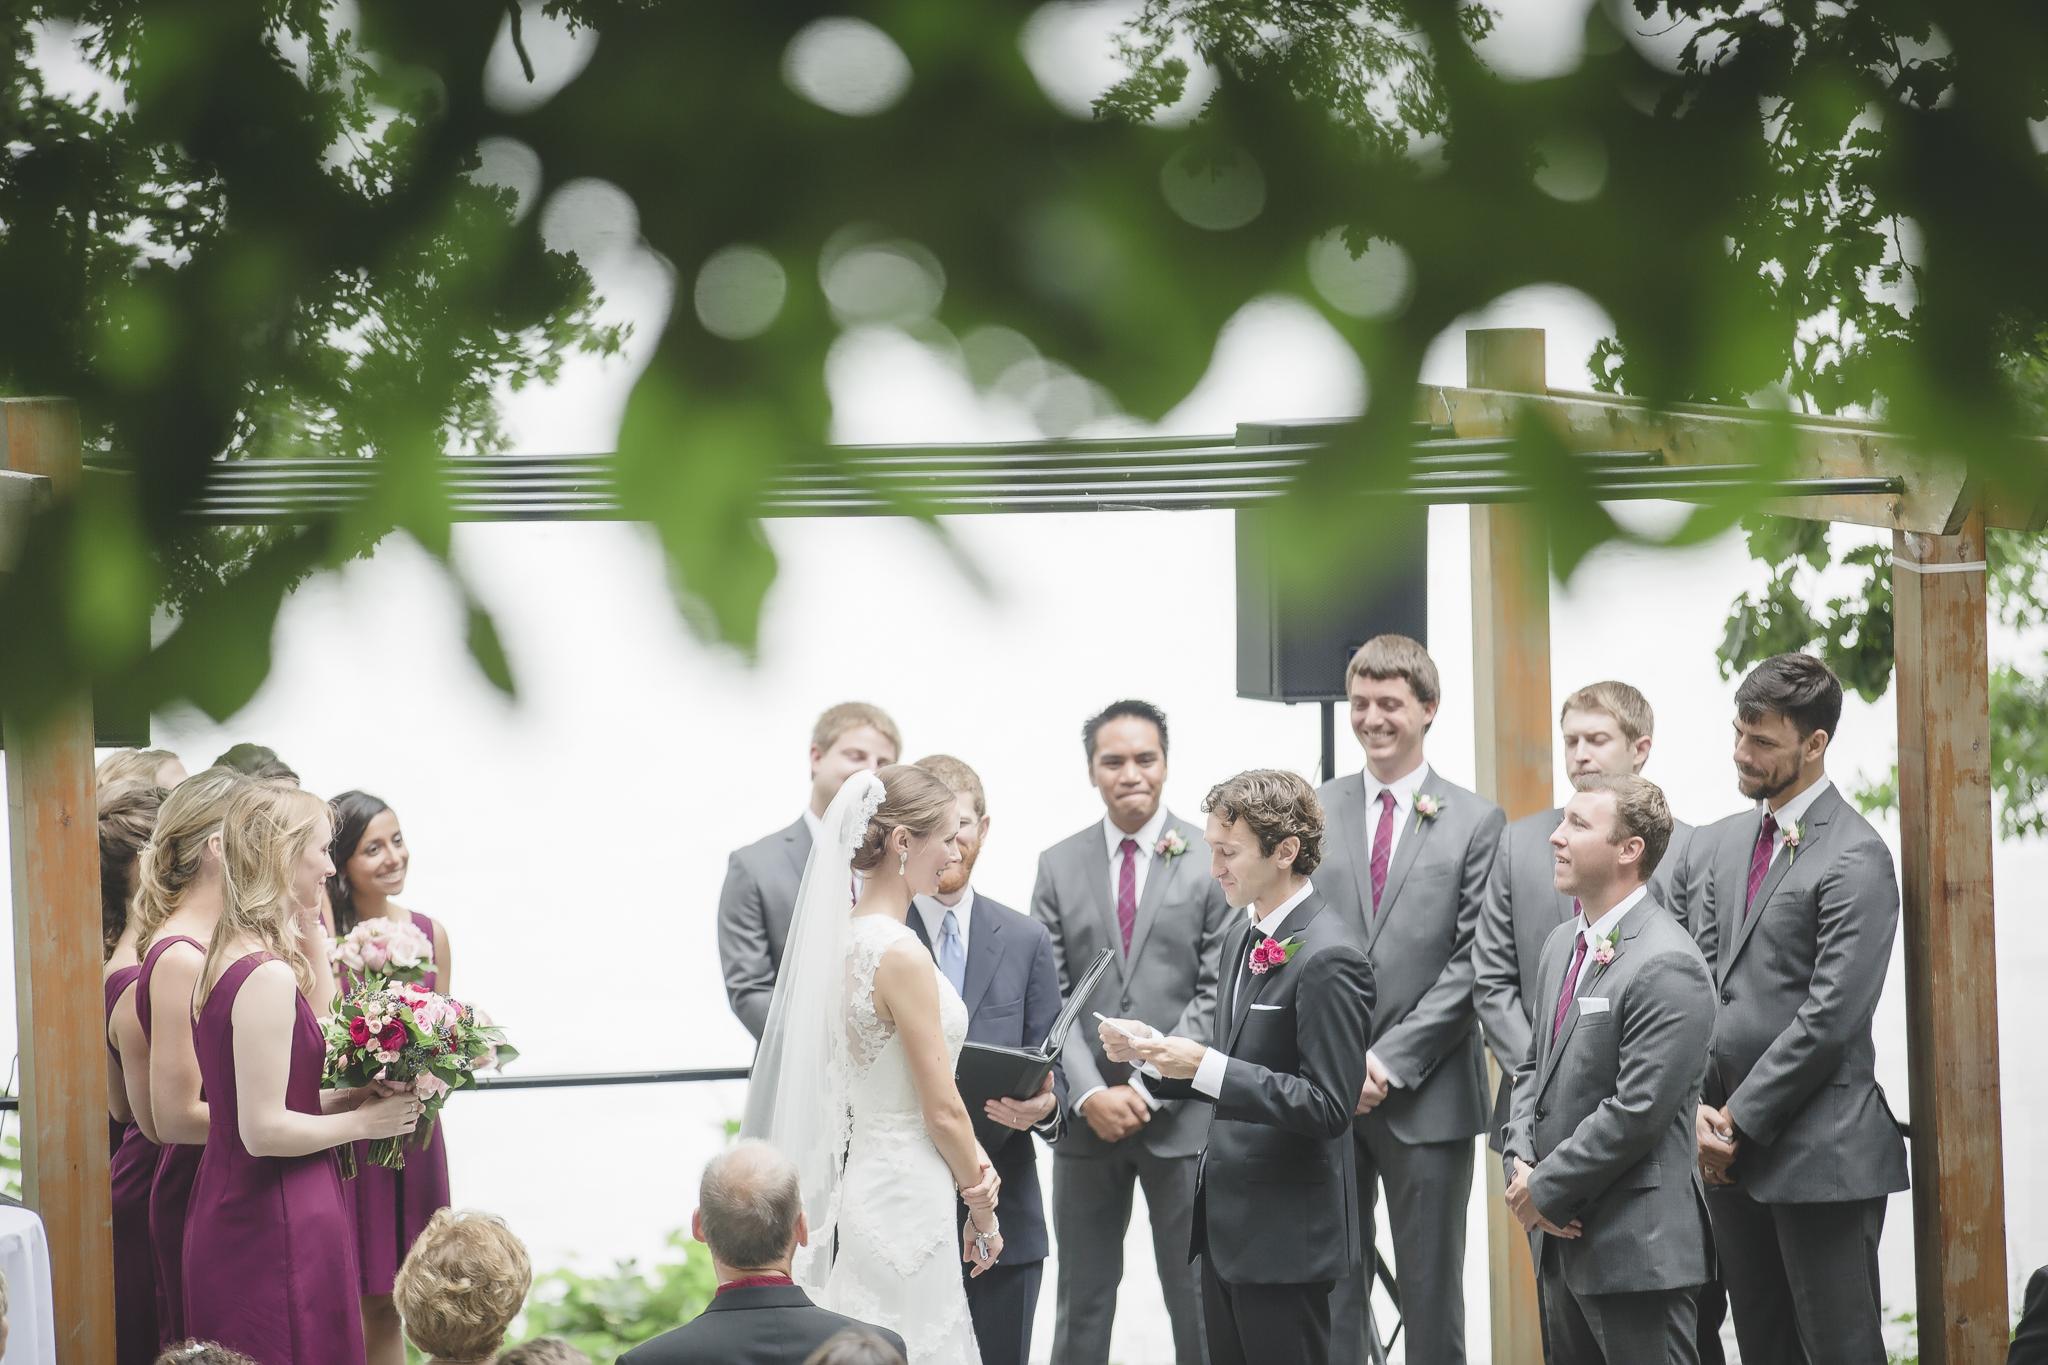 james j hill library wedding photography-16.jpg